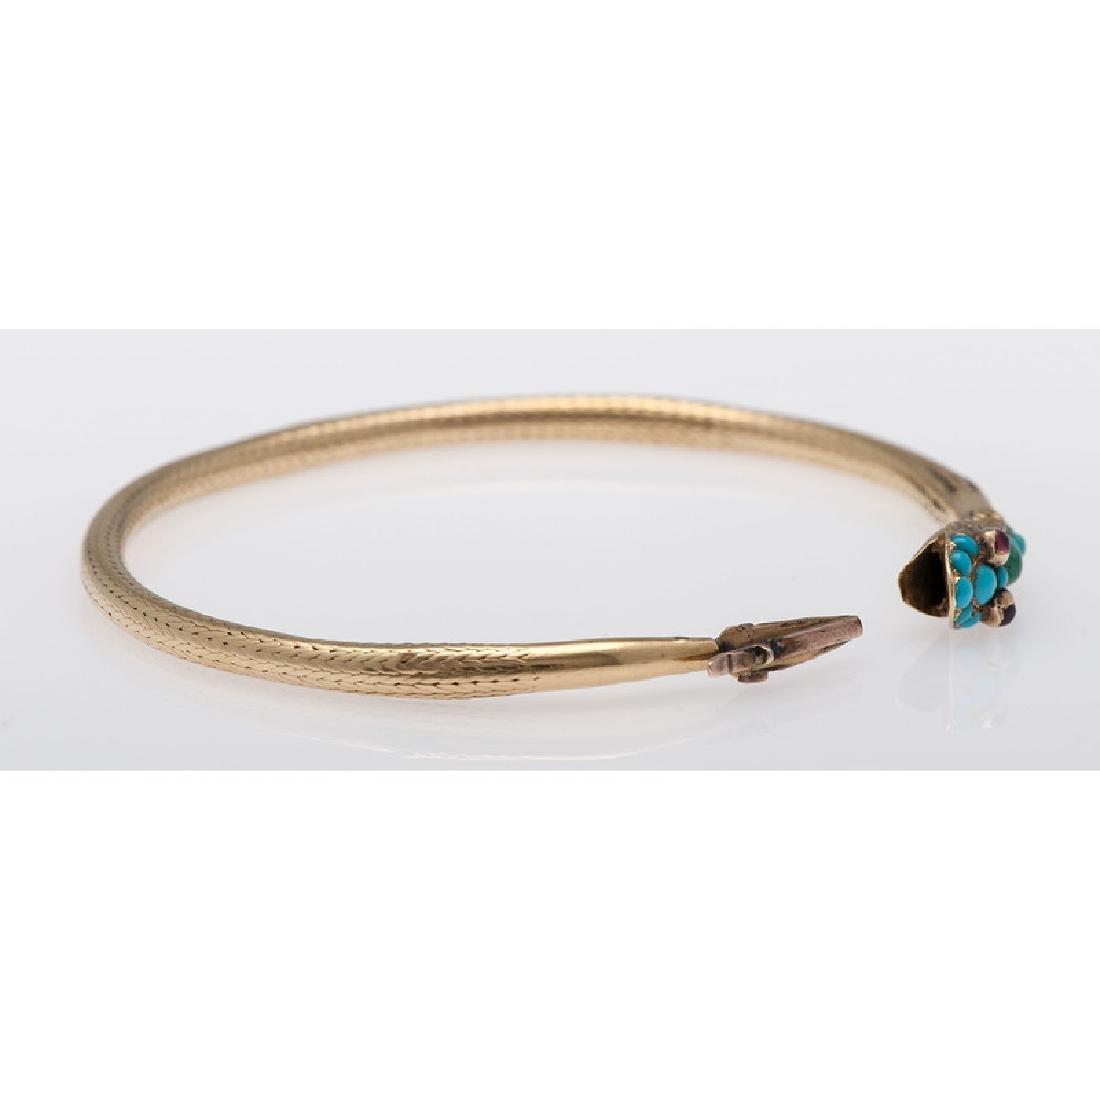 18 Karat Yellow Gold Victorian Serpent Snake Bracelet - 5